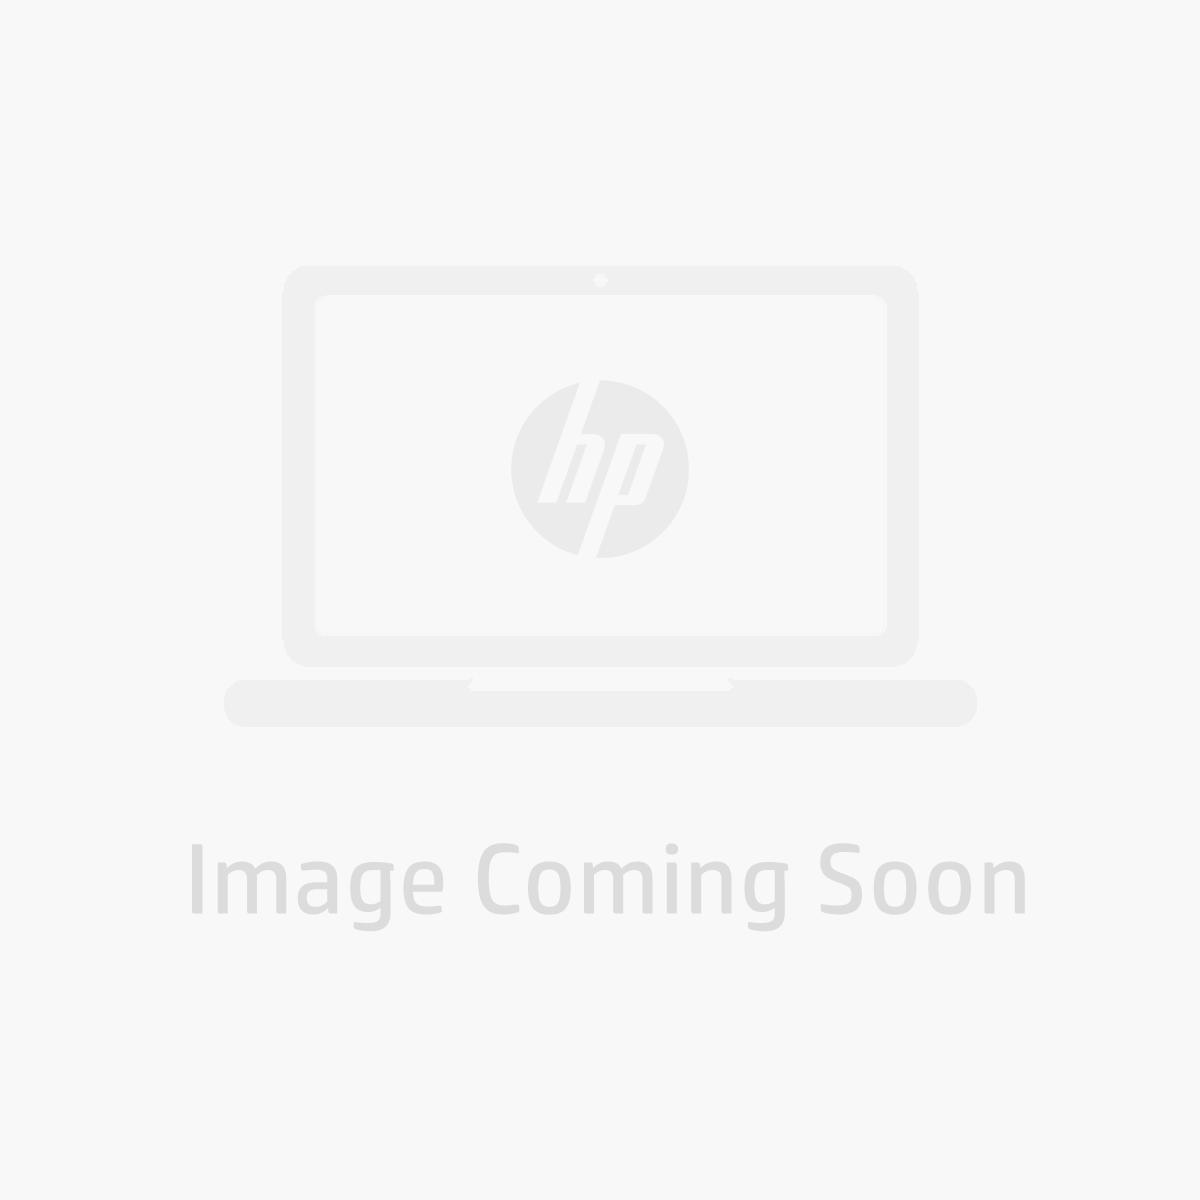 HP x2 210 G2 Detachable PC